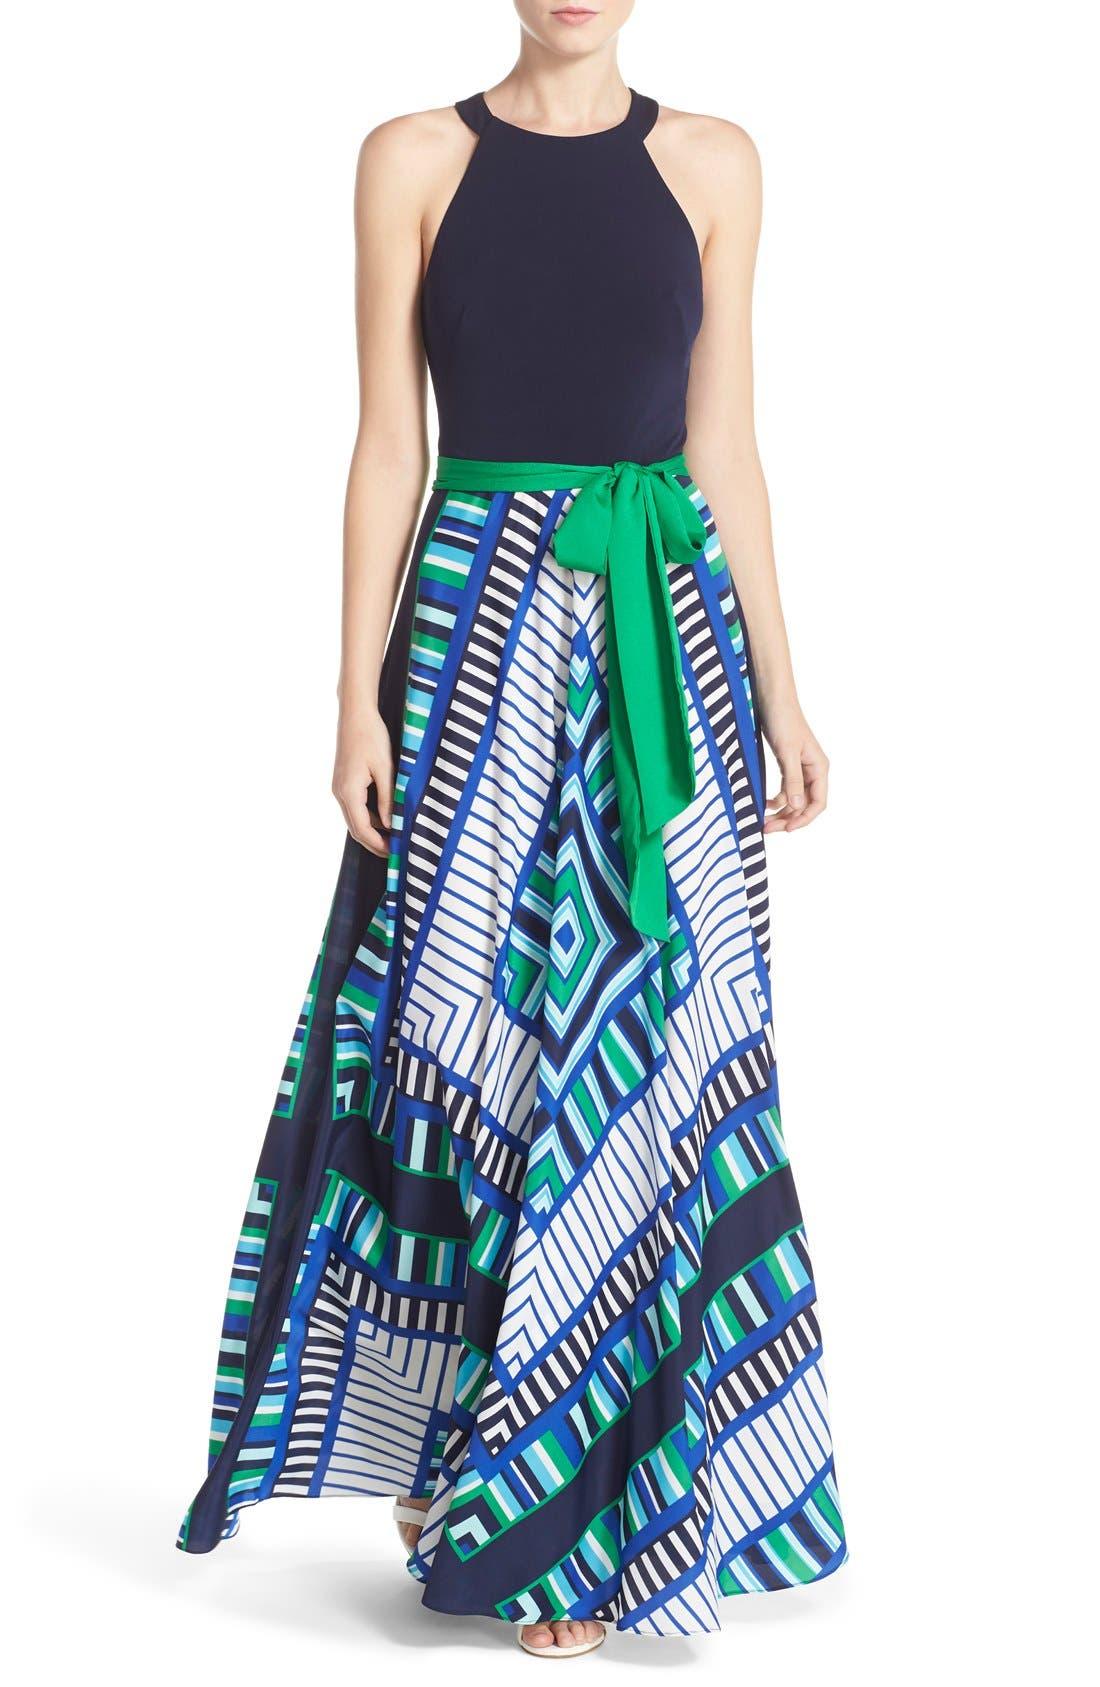 Alternate Image 1 Selected - Eliza J Scarf Print Jersey & Crêpe de Chine Maxi Dress (Regular & Petite)